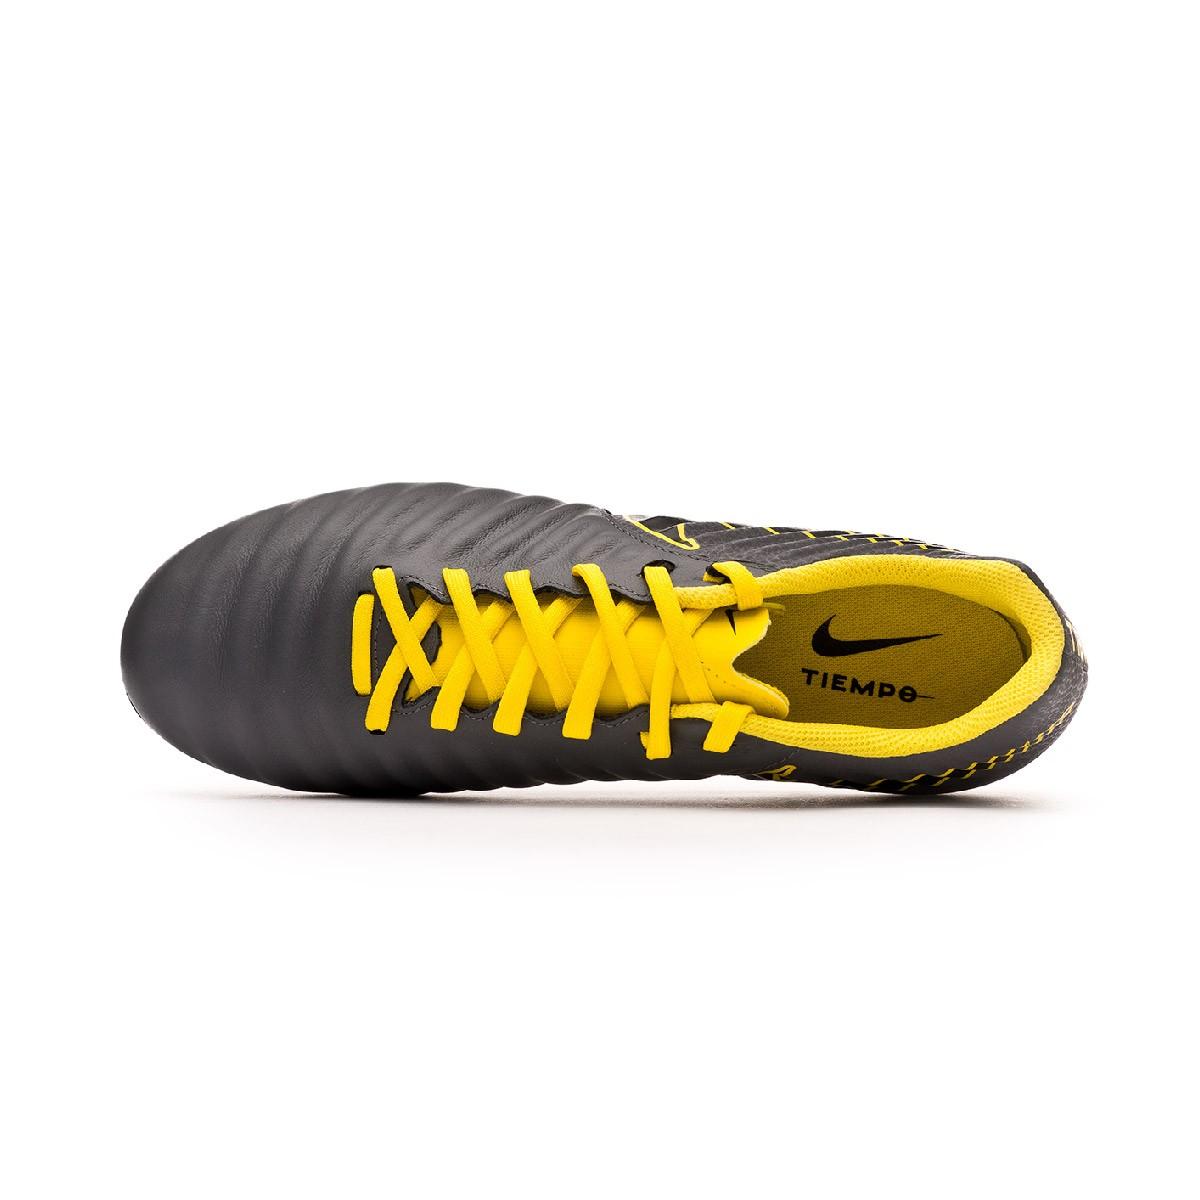 d4962e2af Football Boots Nike Tiempo Legend VII Academy SG-Pro ACC Dark  grey-Black-Optical yellow - Football store Fútbol Emotion